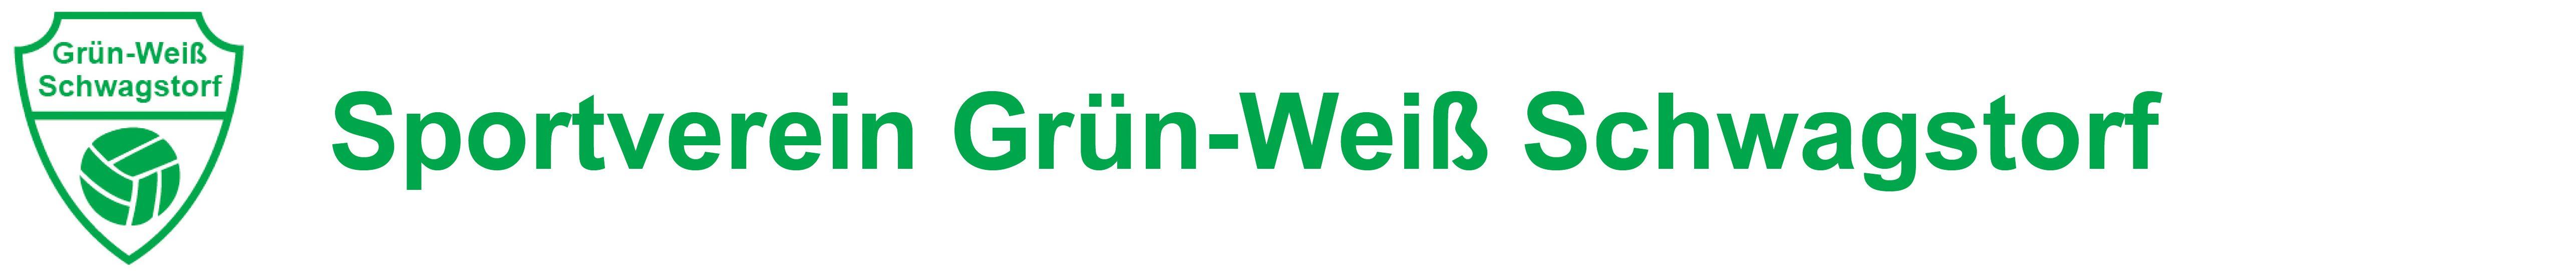 Grün-Weiß Schwagstorf